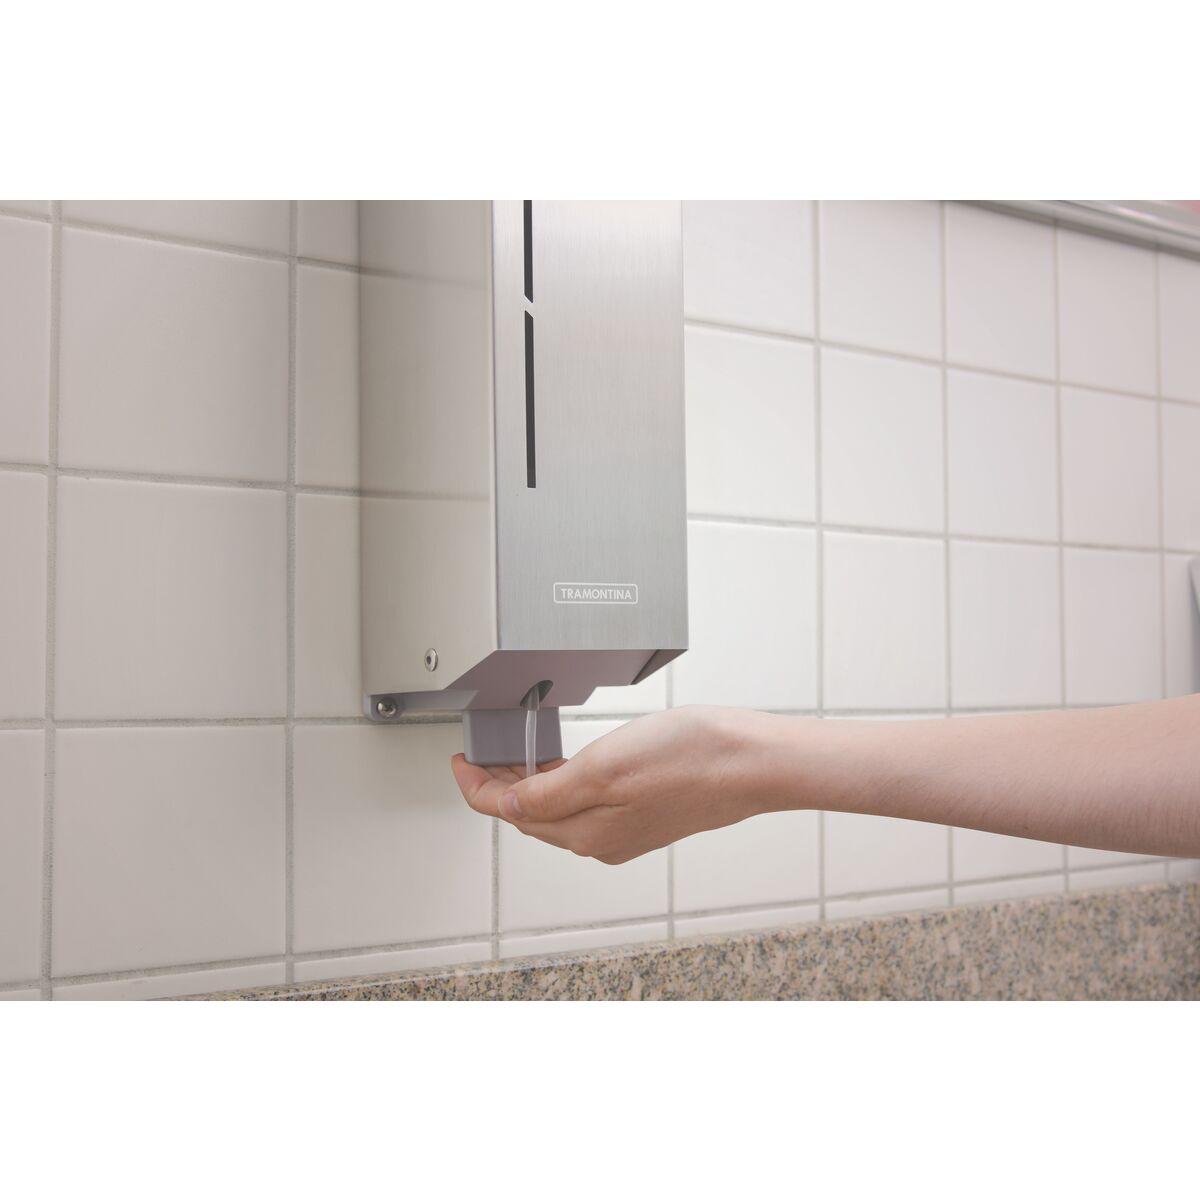 Tramontina - Dispensador de jabón líquido o gel antibacterial